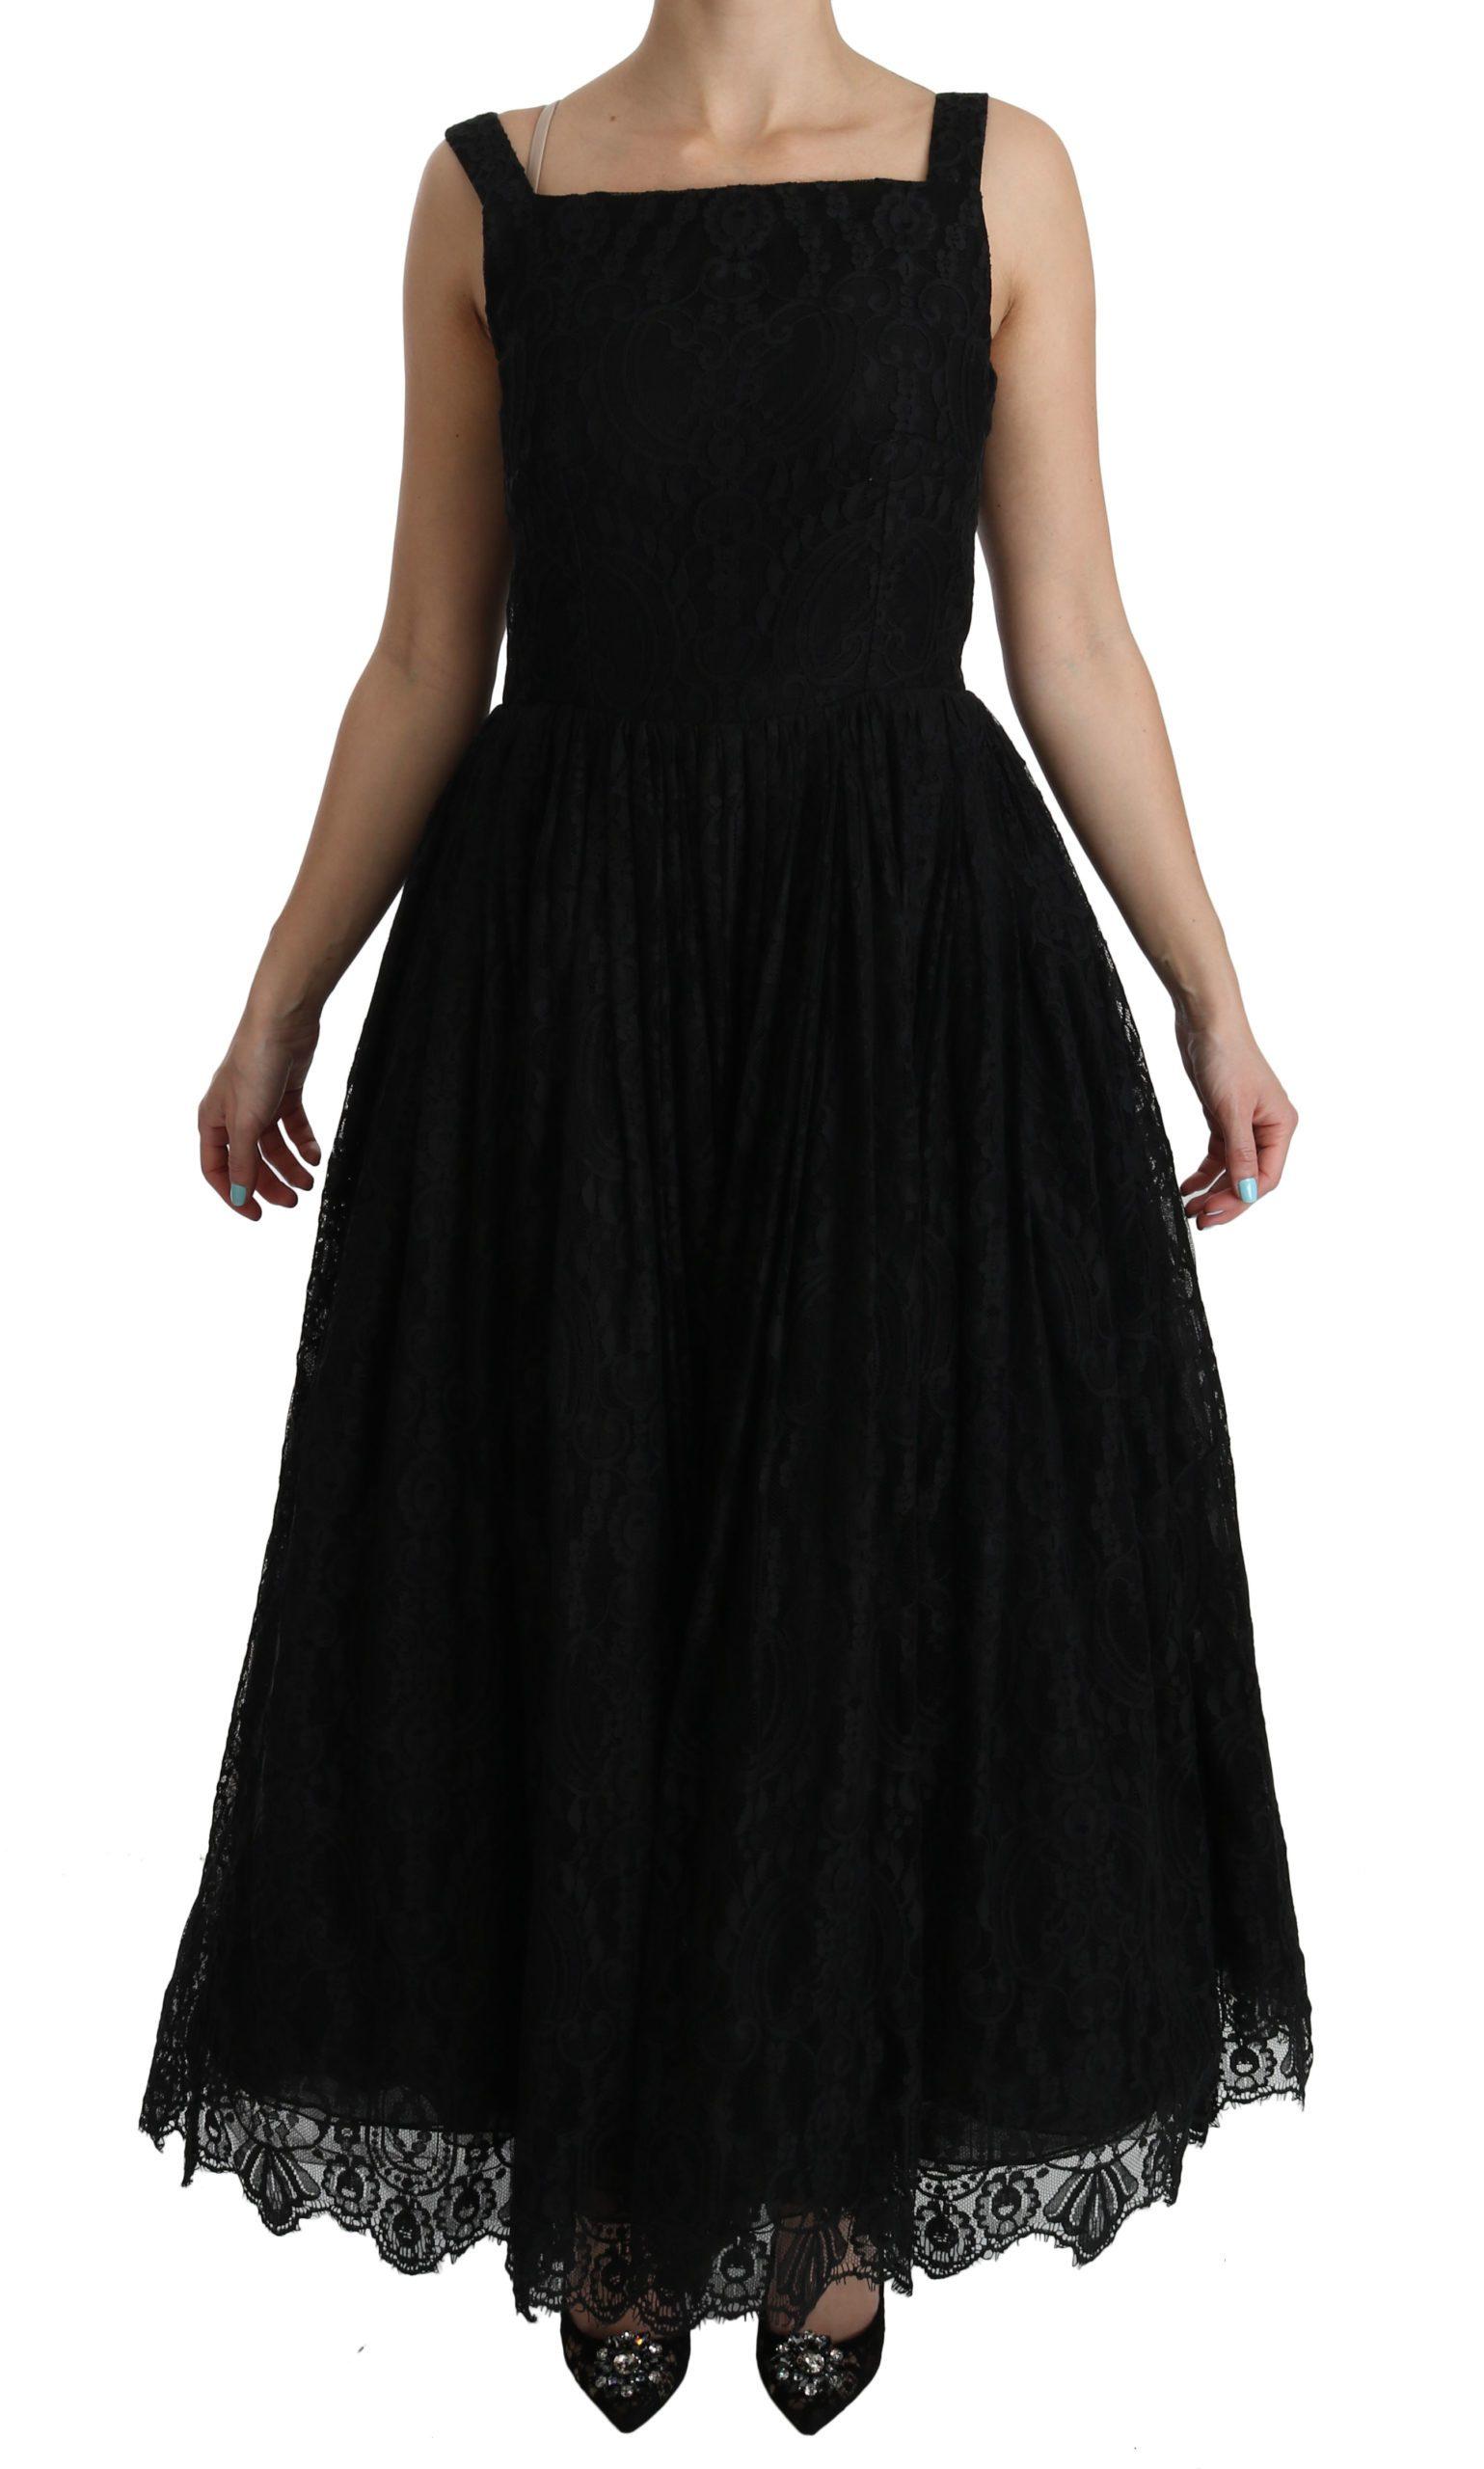 Dolce & Gabbana Women's Lace A-Line Pleated Long Gown Dress Black DR2062 - IT44|L